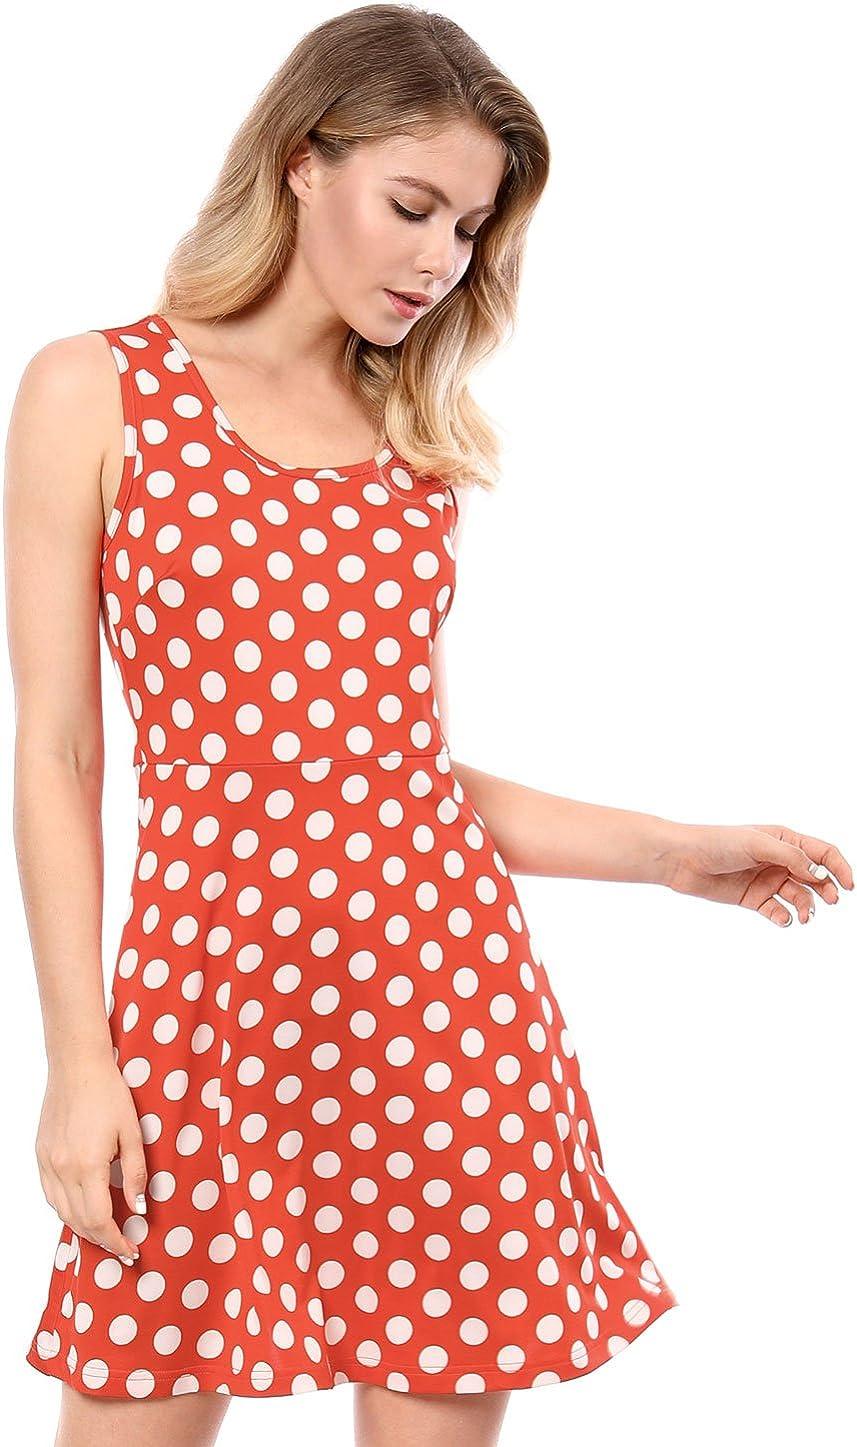 Allegra K Women's Polka Dots Summer A-Line Above Knee Sleeveless Vintage Dress